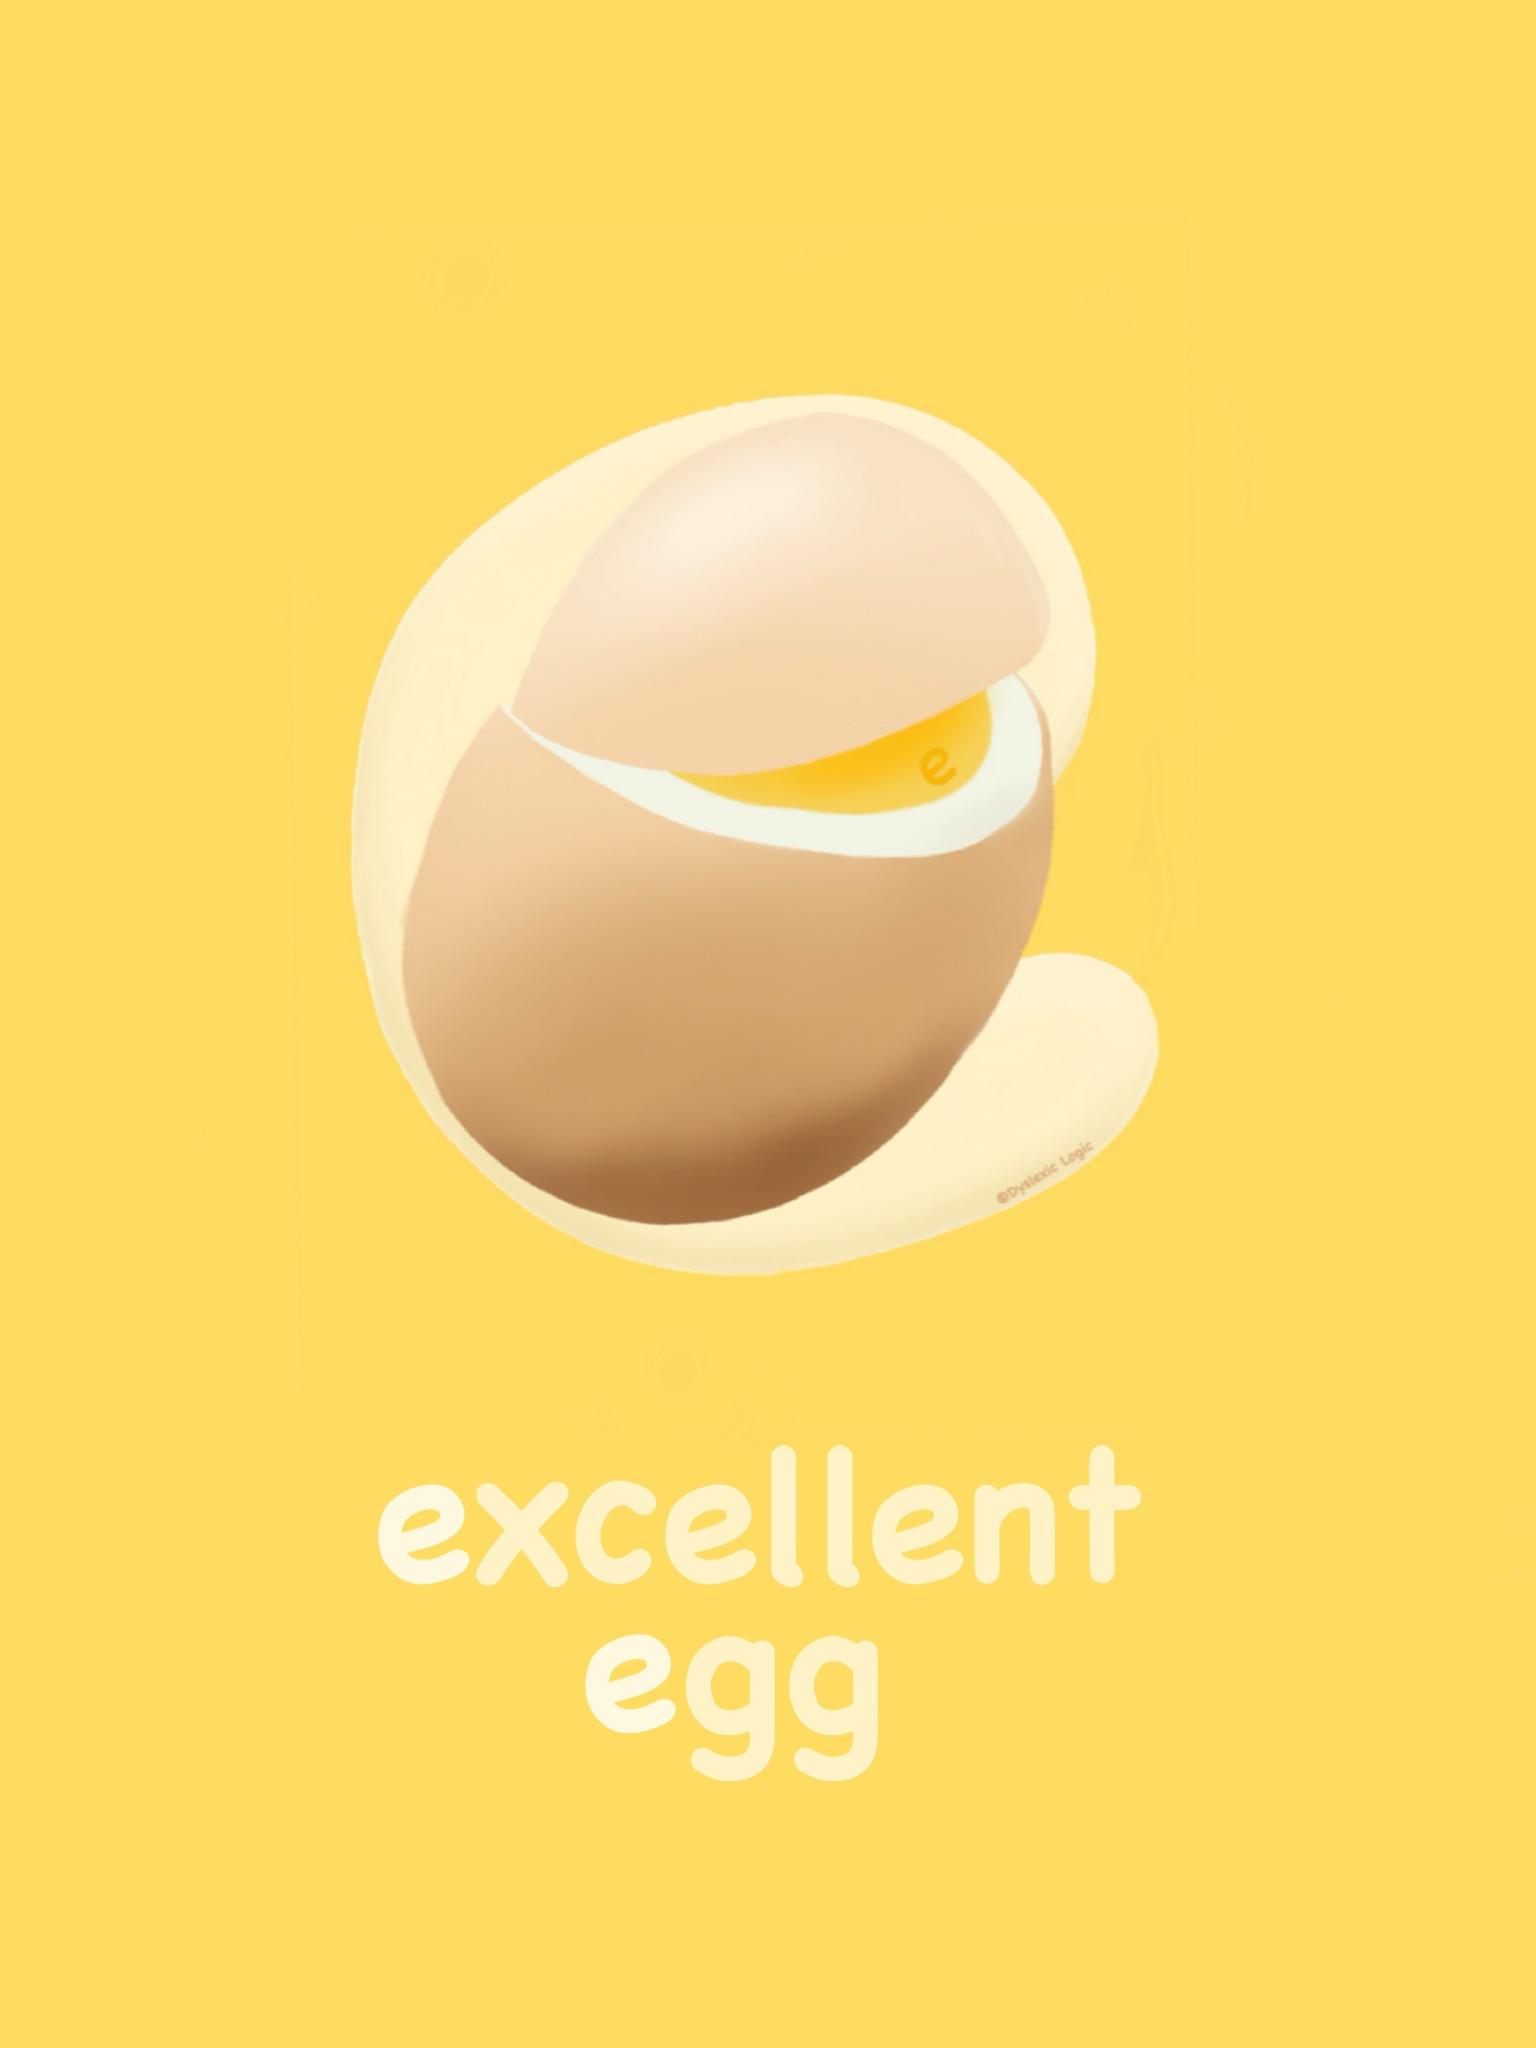 Letter E- Excellent Egg